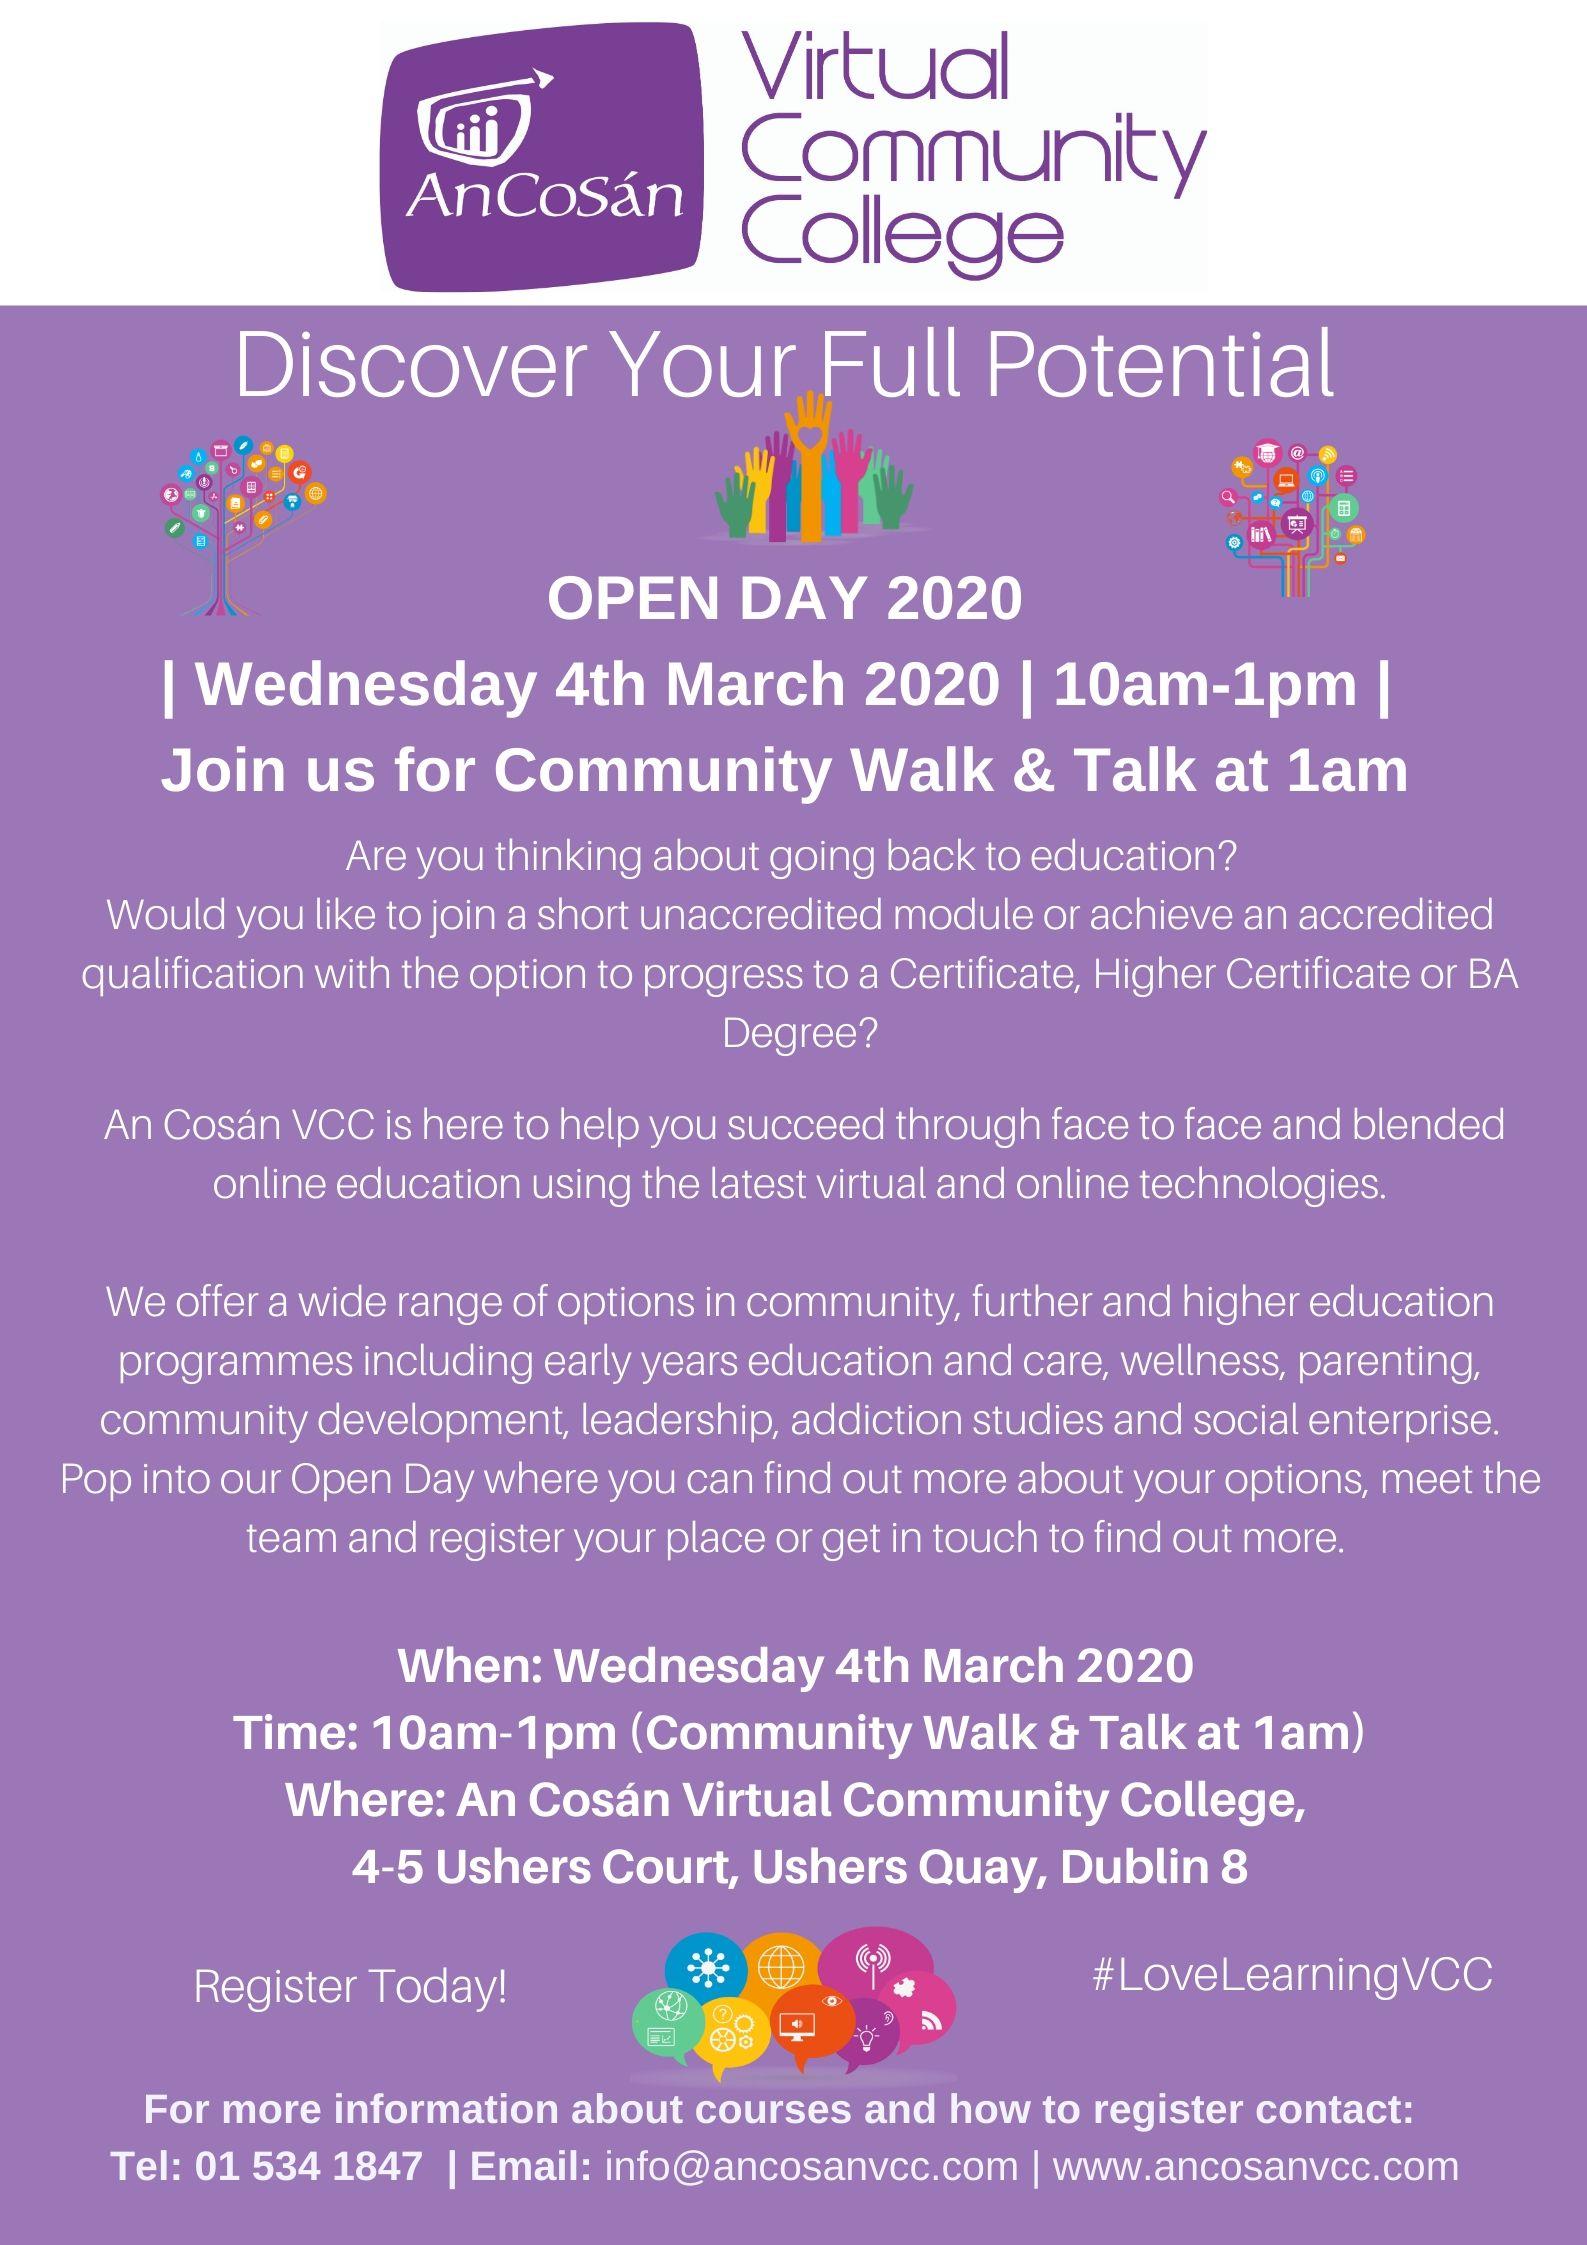 An Cosán VCC Open Day